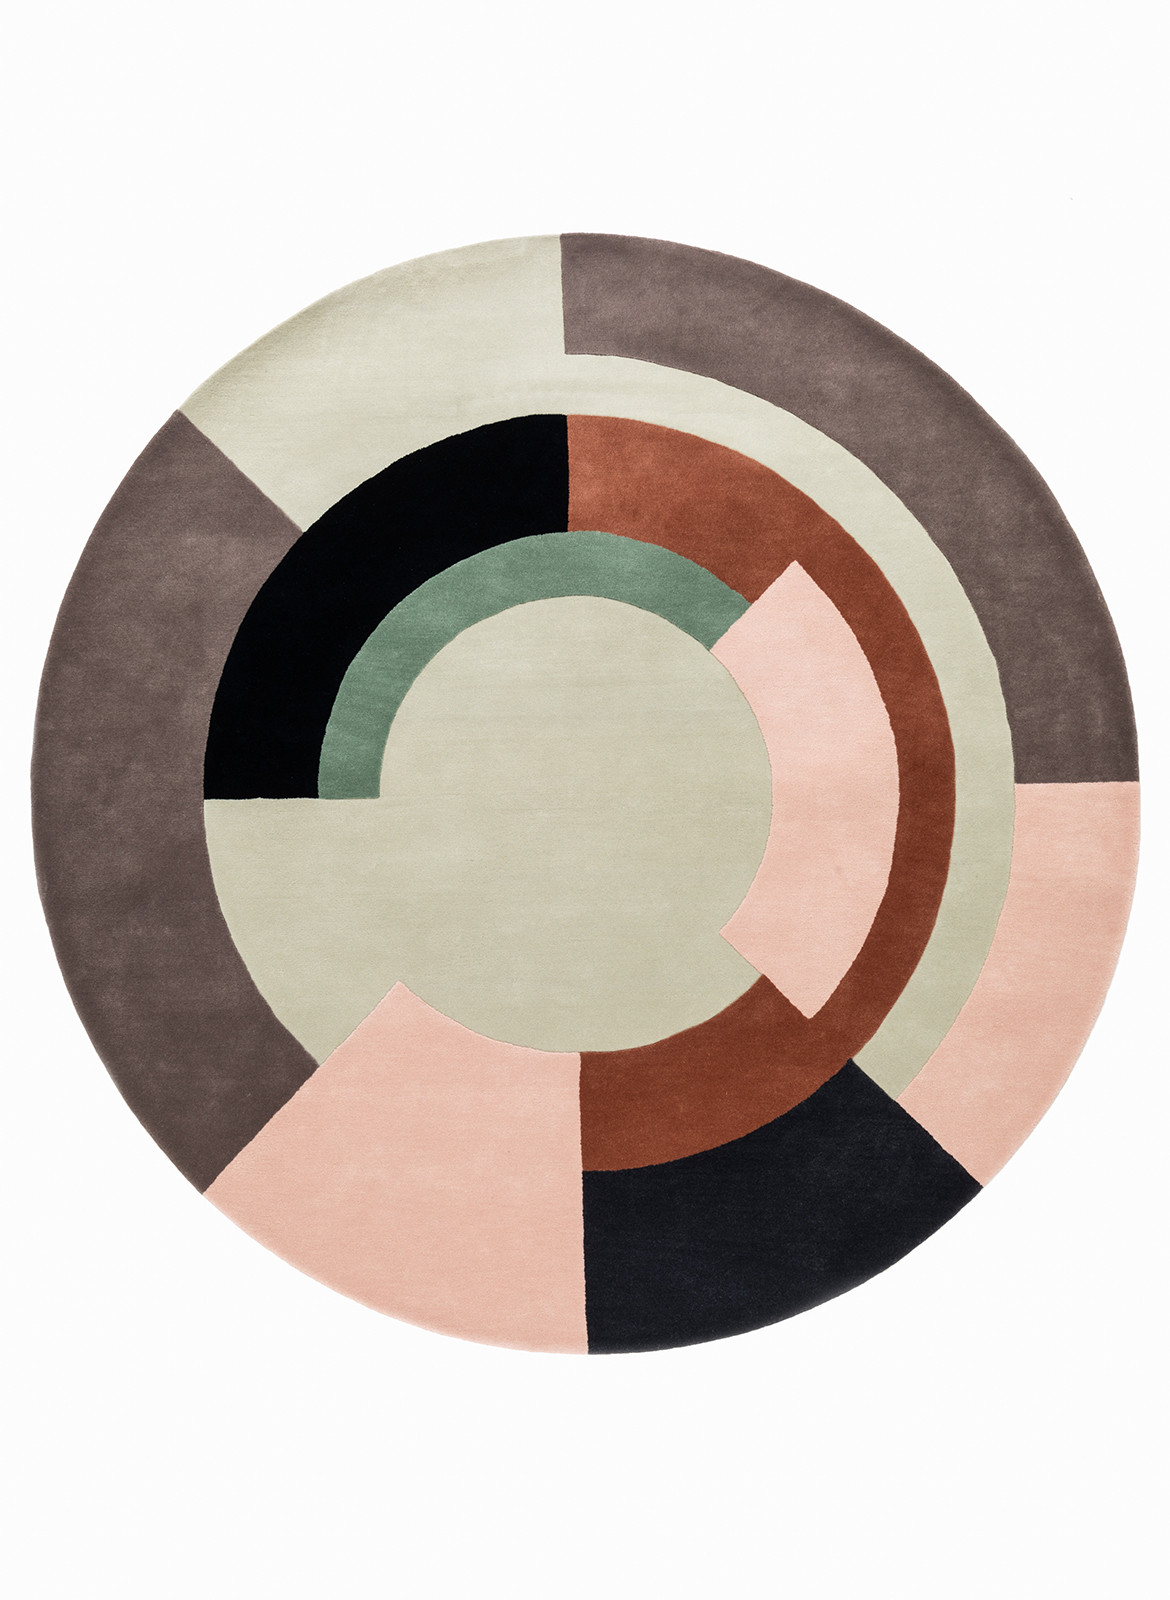 Designer Rugs Bernabeifreeman CC Richard Whitman plateau colours